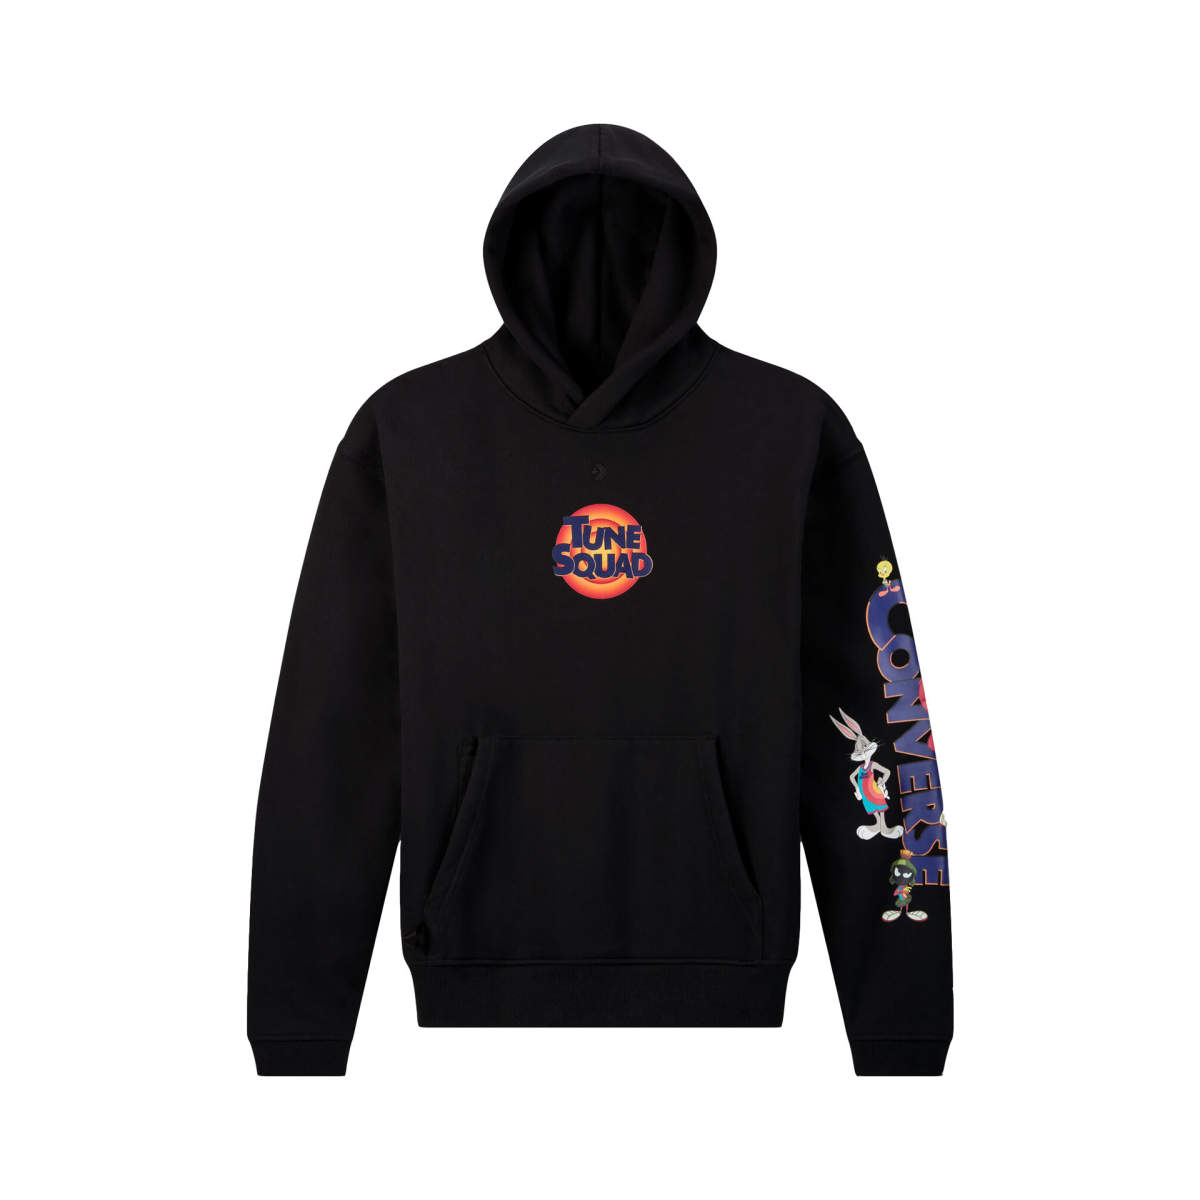 Converse x space jam court ready po hoodie